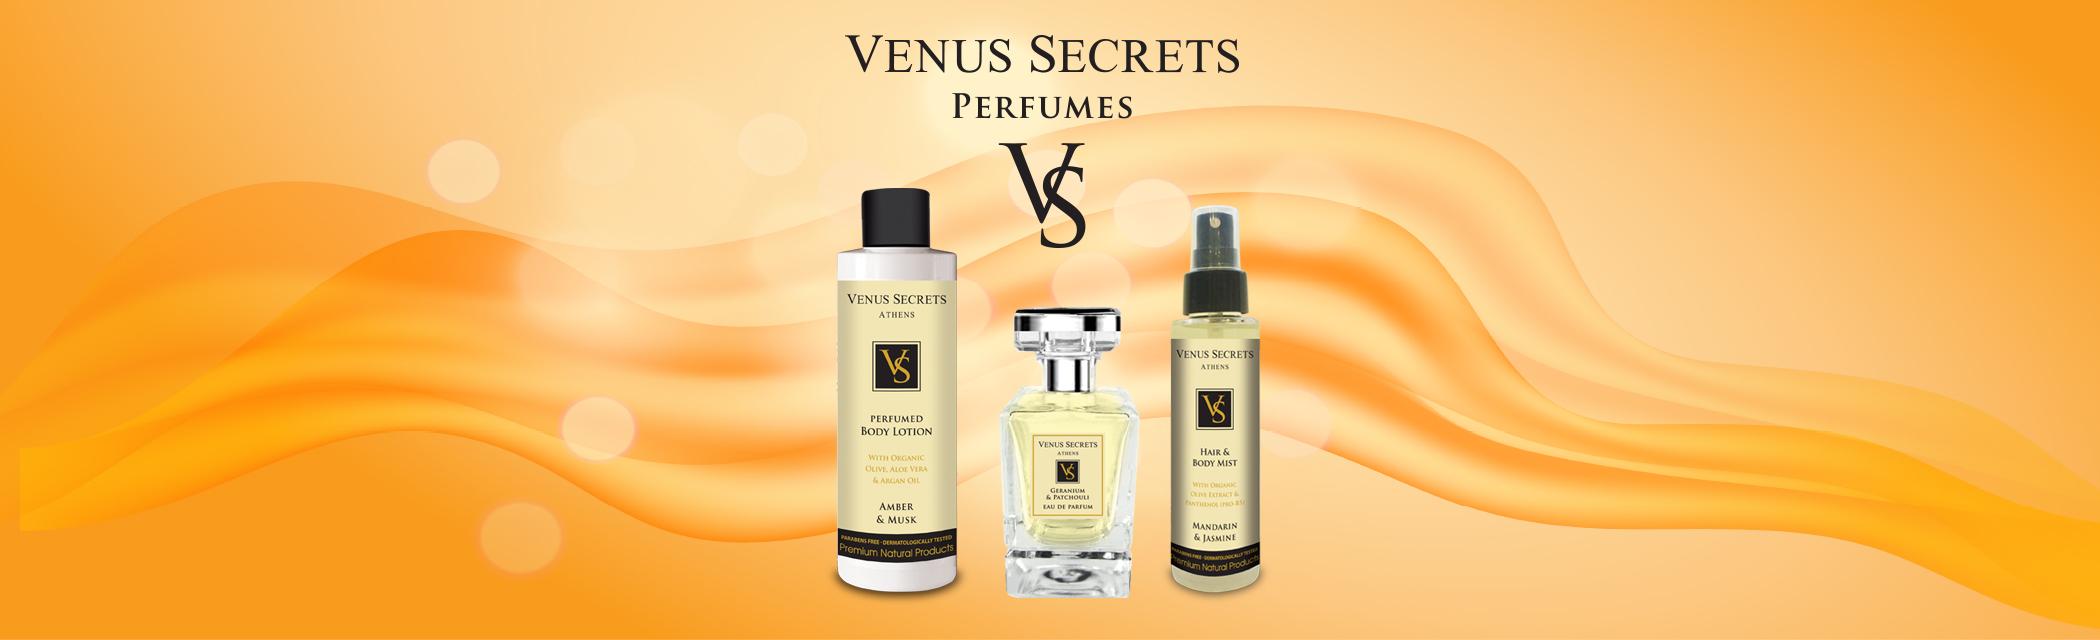 Venus Secrets Perfumes - Αρώματα Venus Secrets